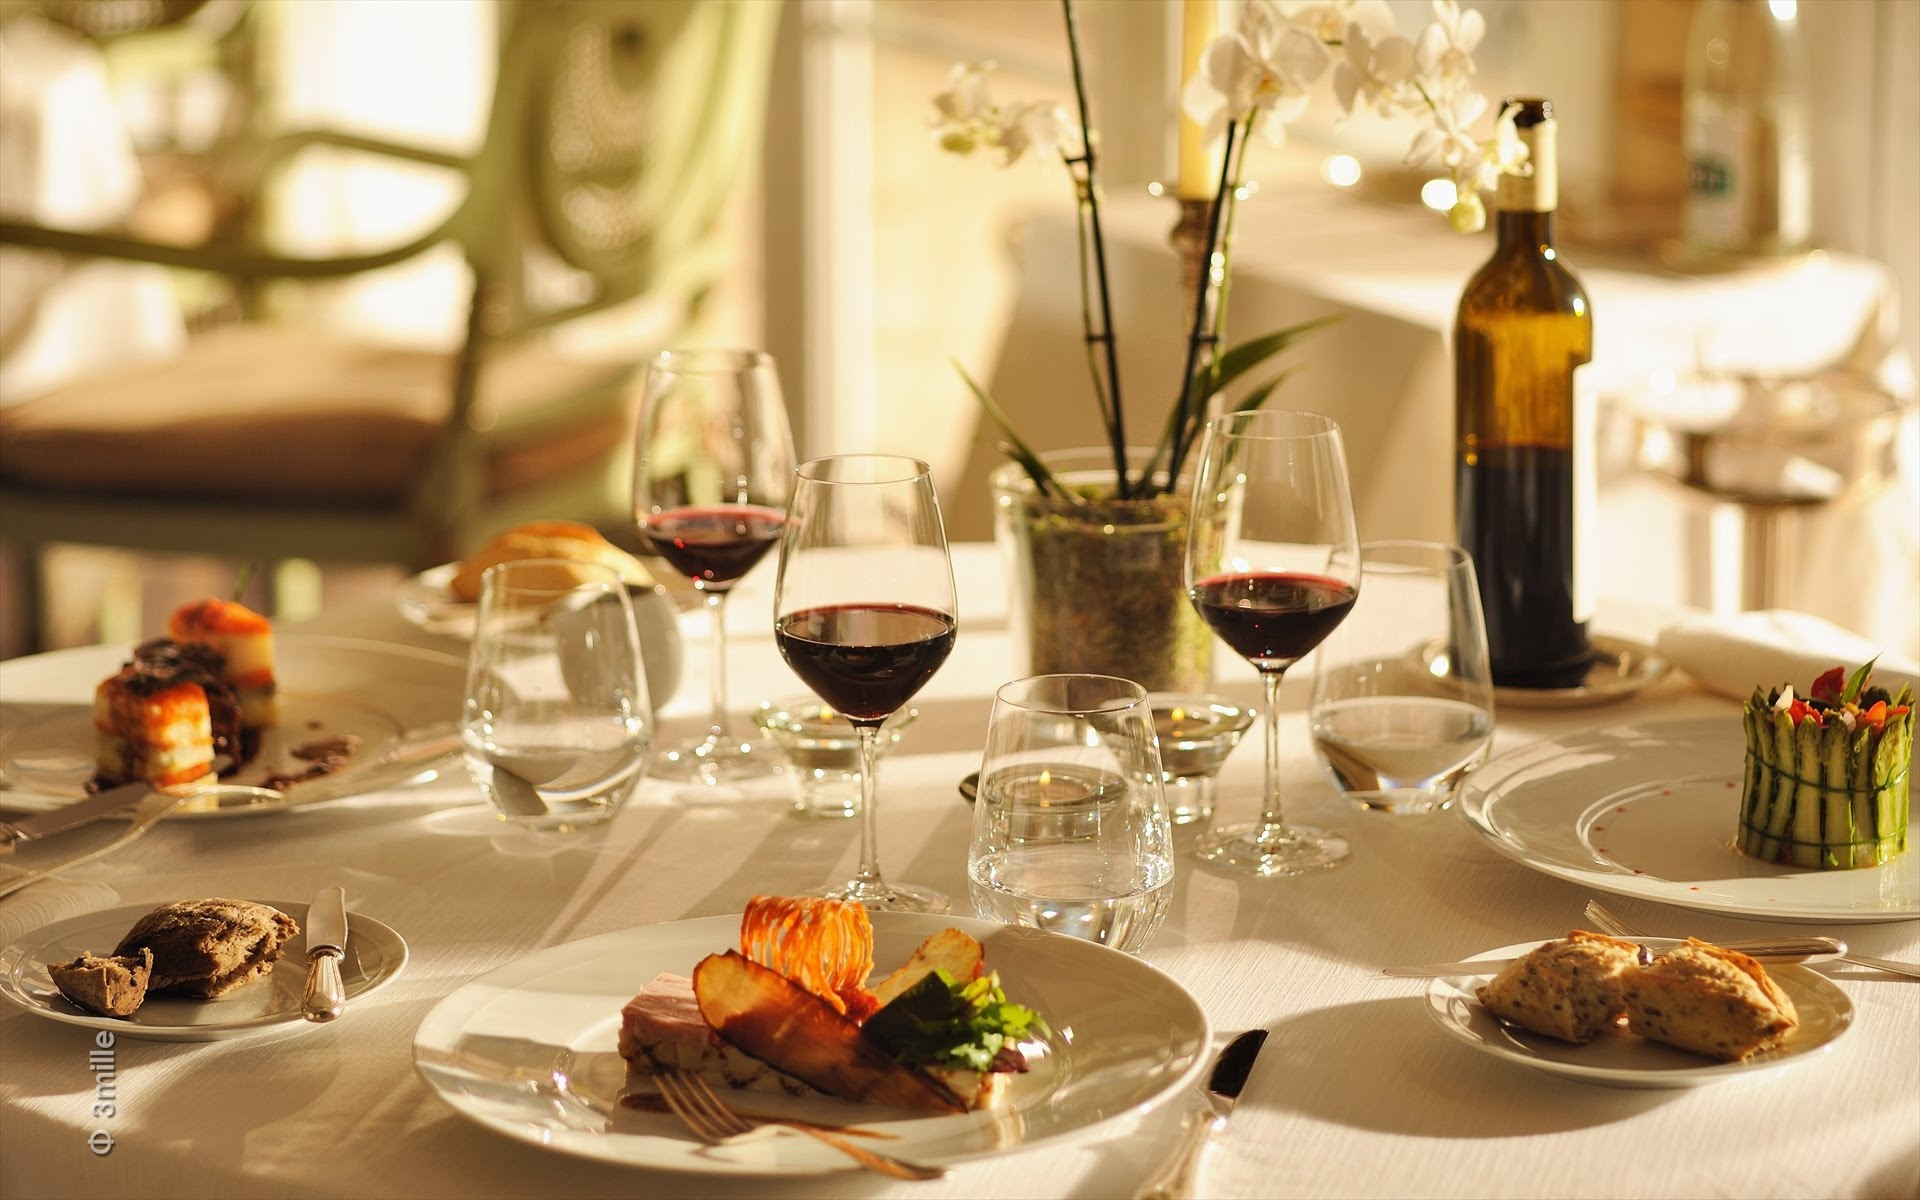 Le service au restaurant   Madagascar Hôtel Consultant ...